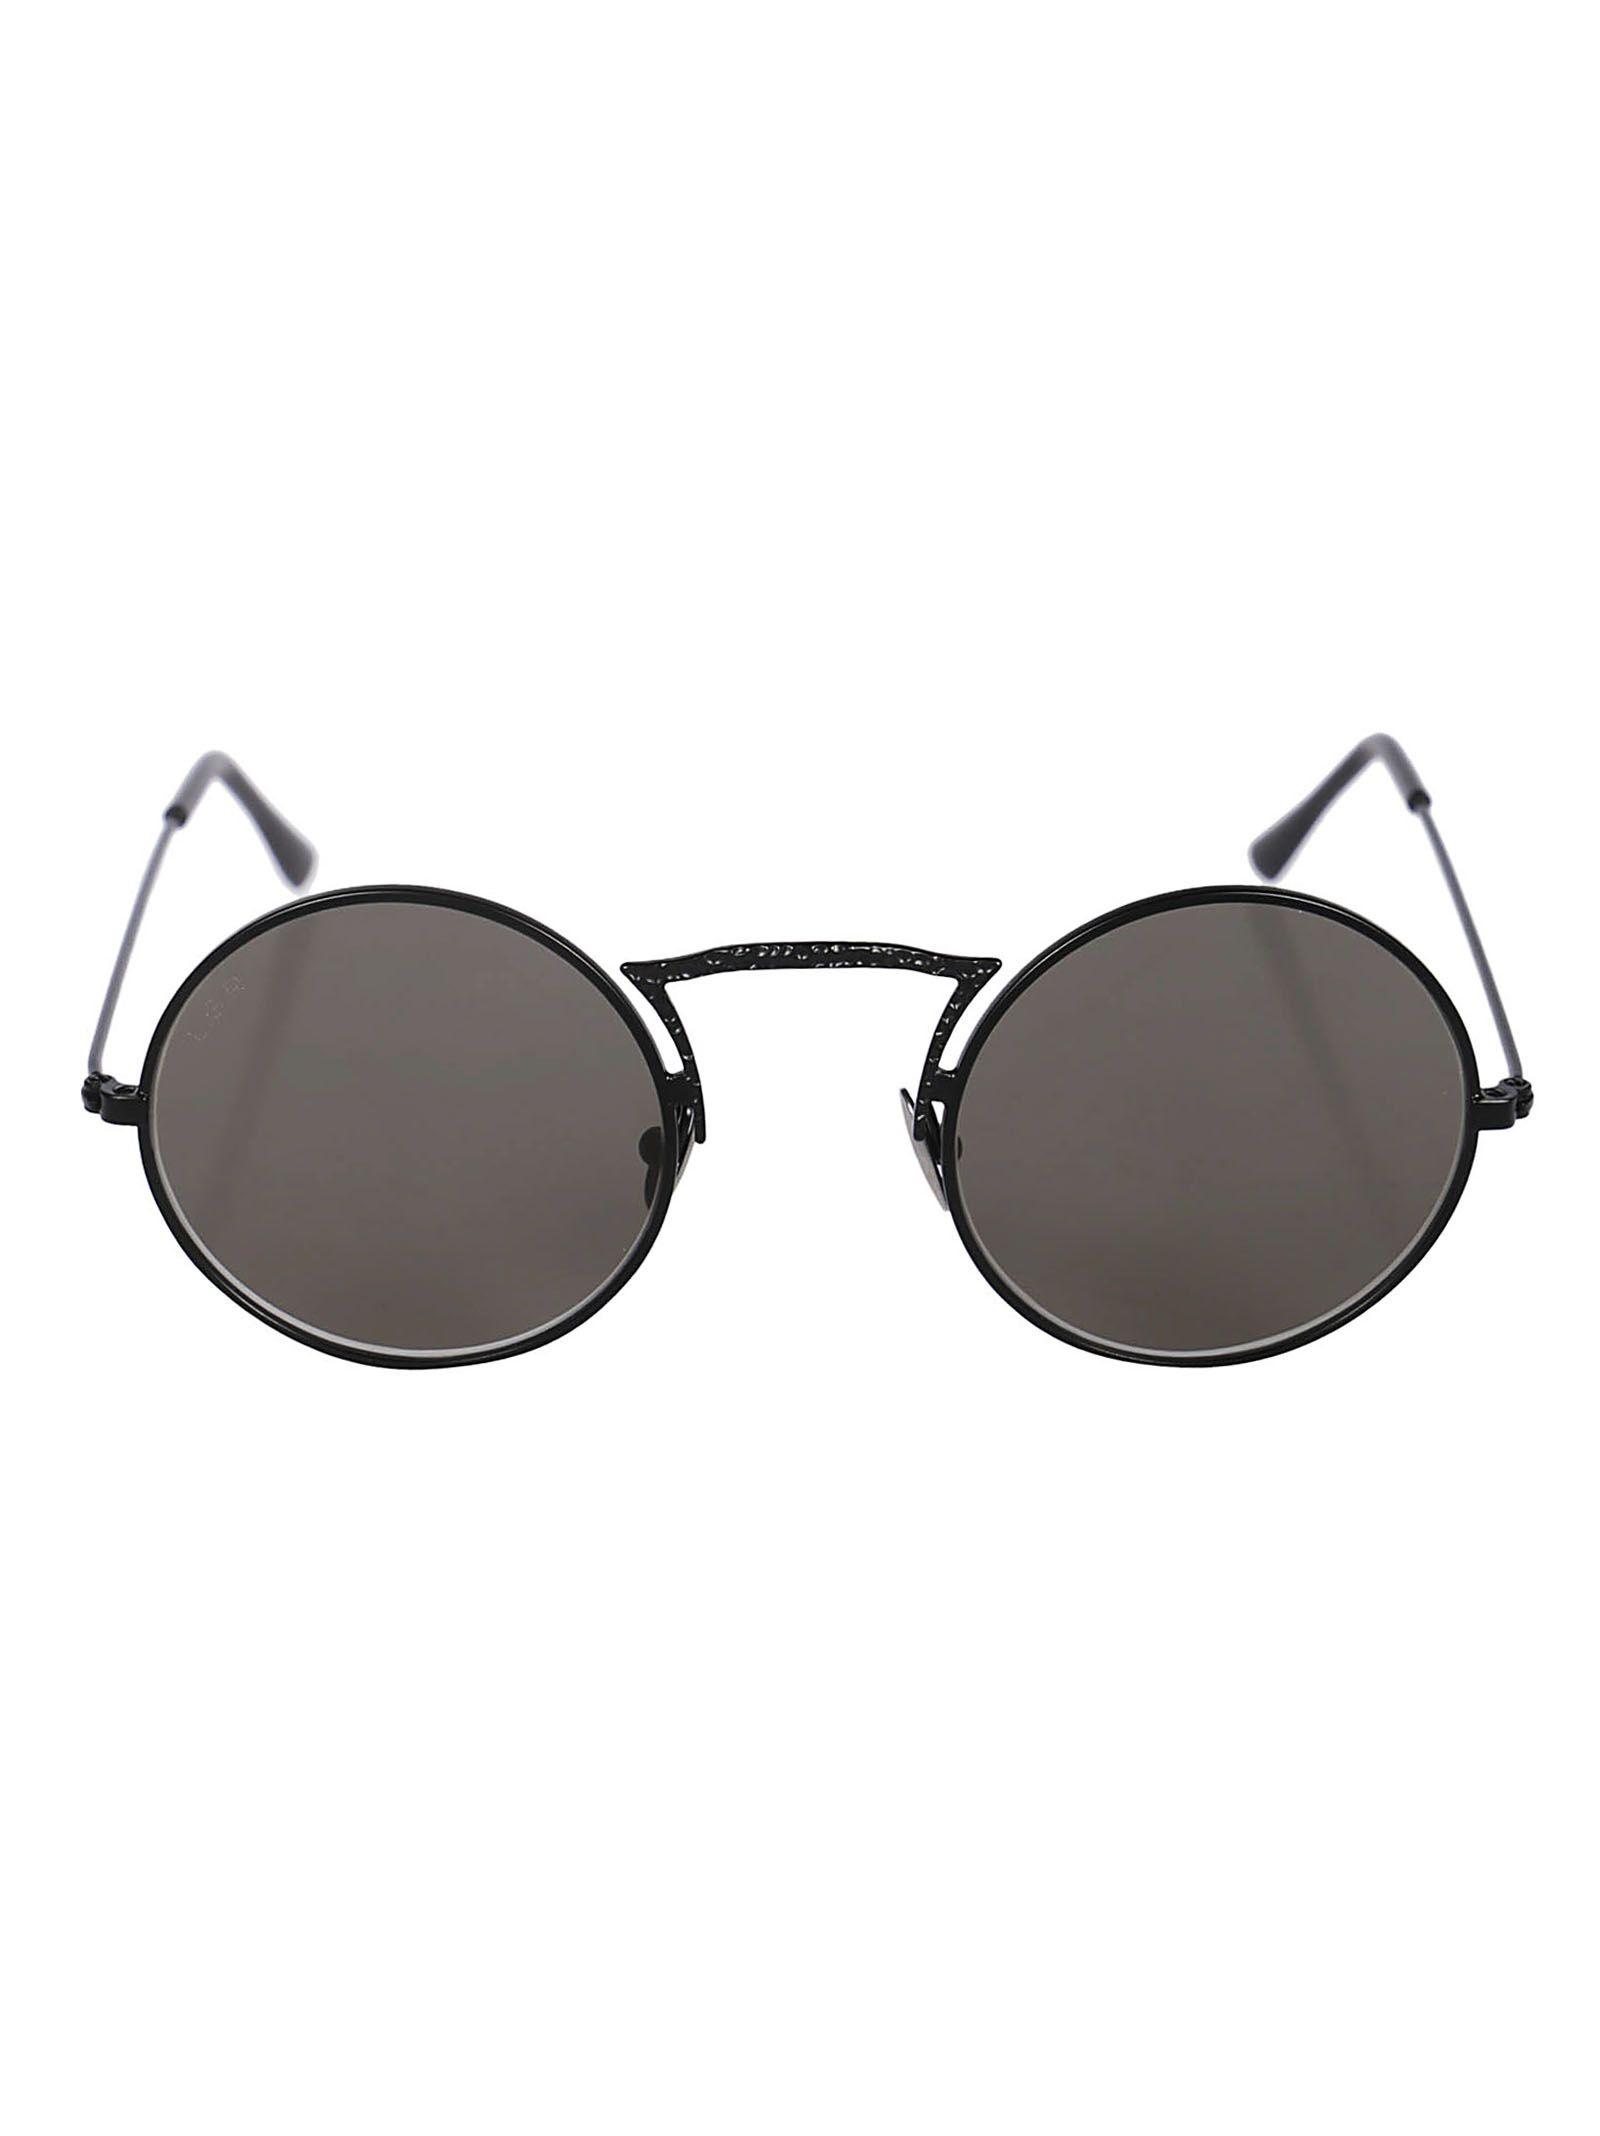 L.G.R Lgr Monastir Sunglasses in Black Matte